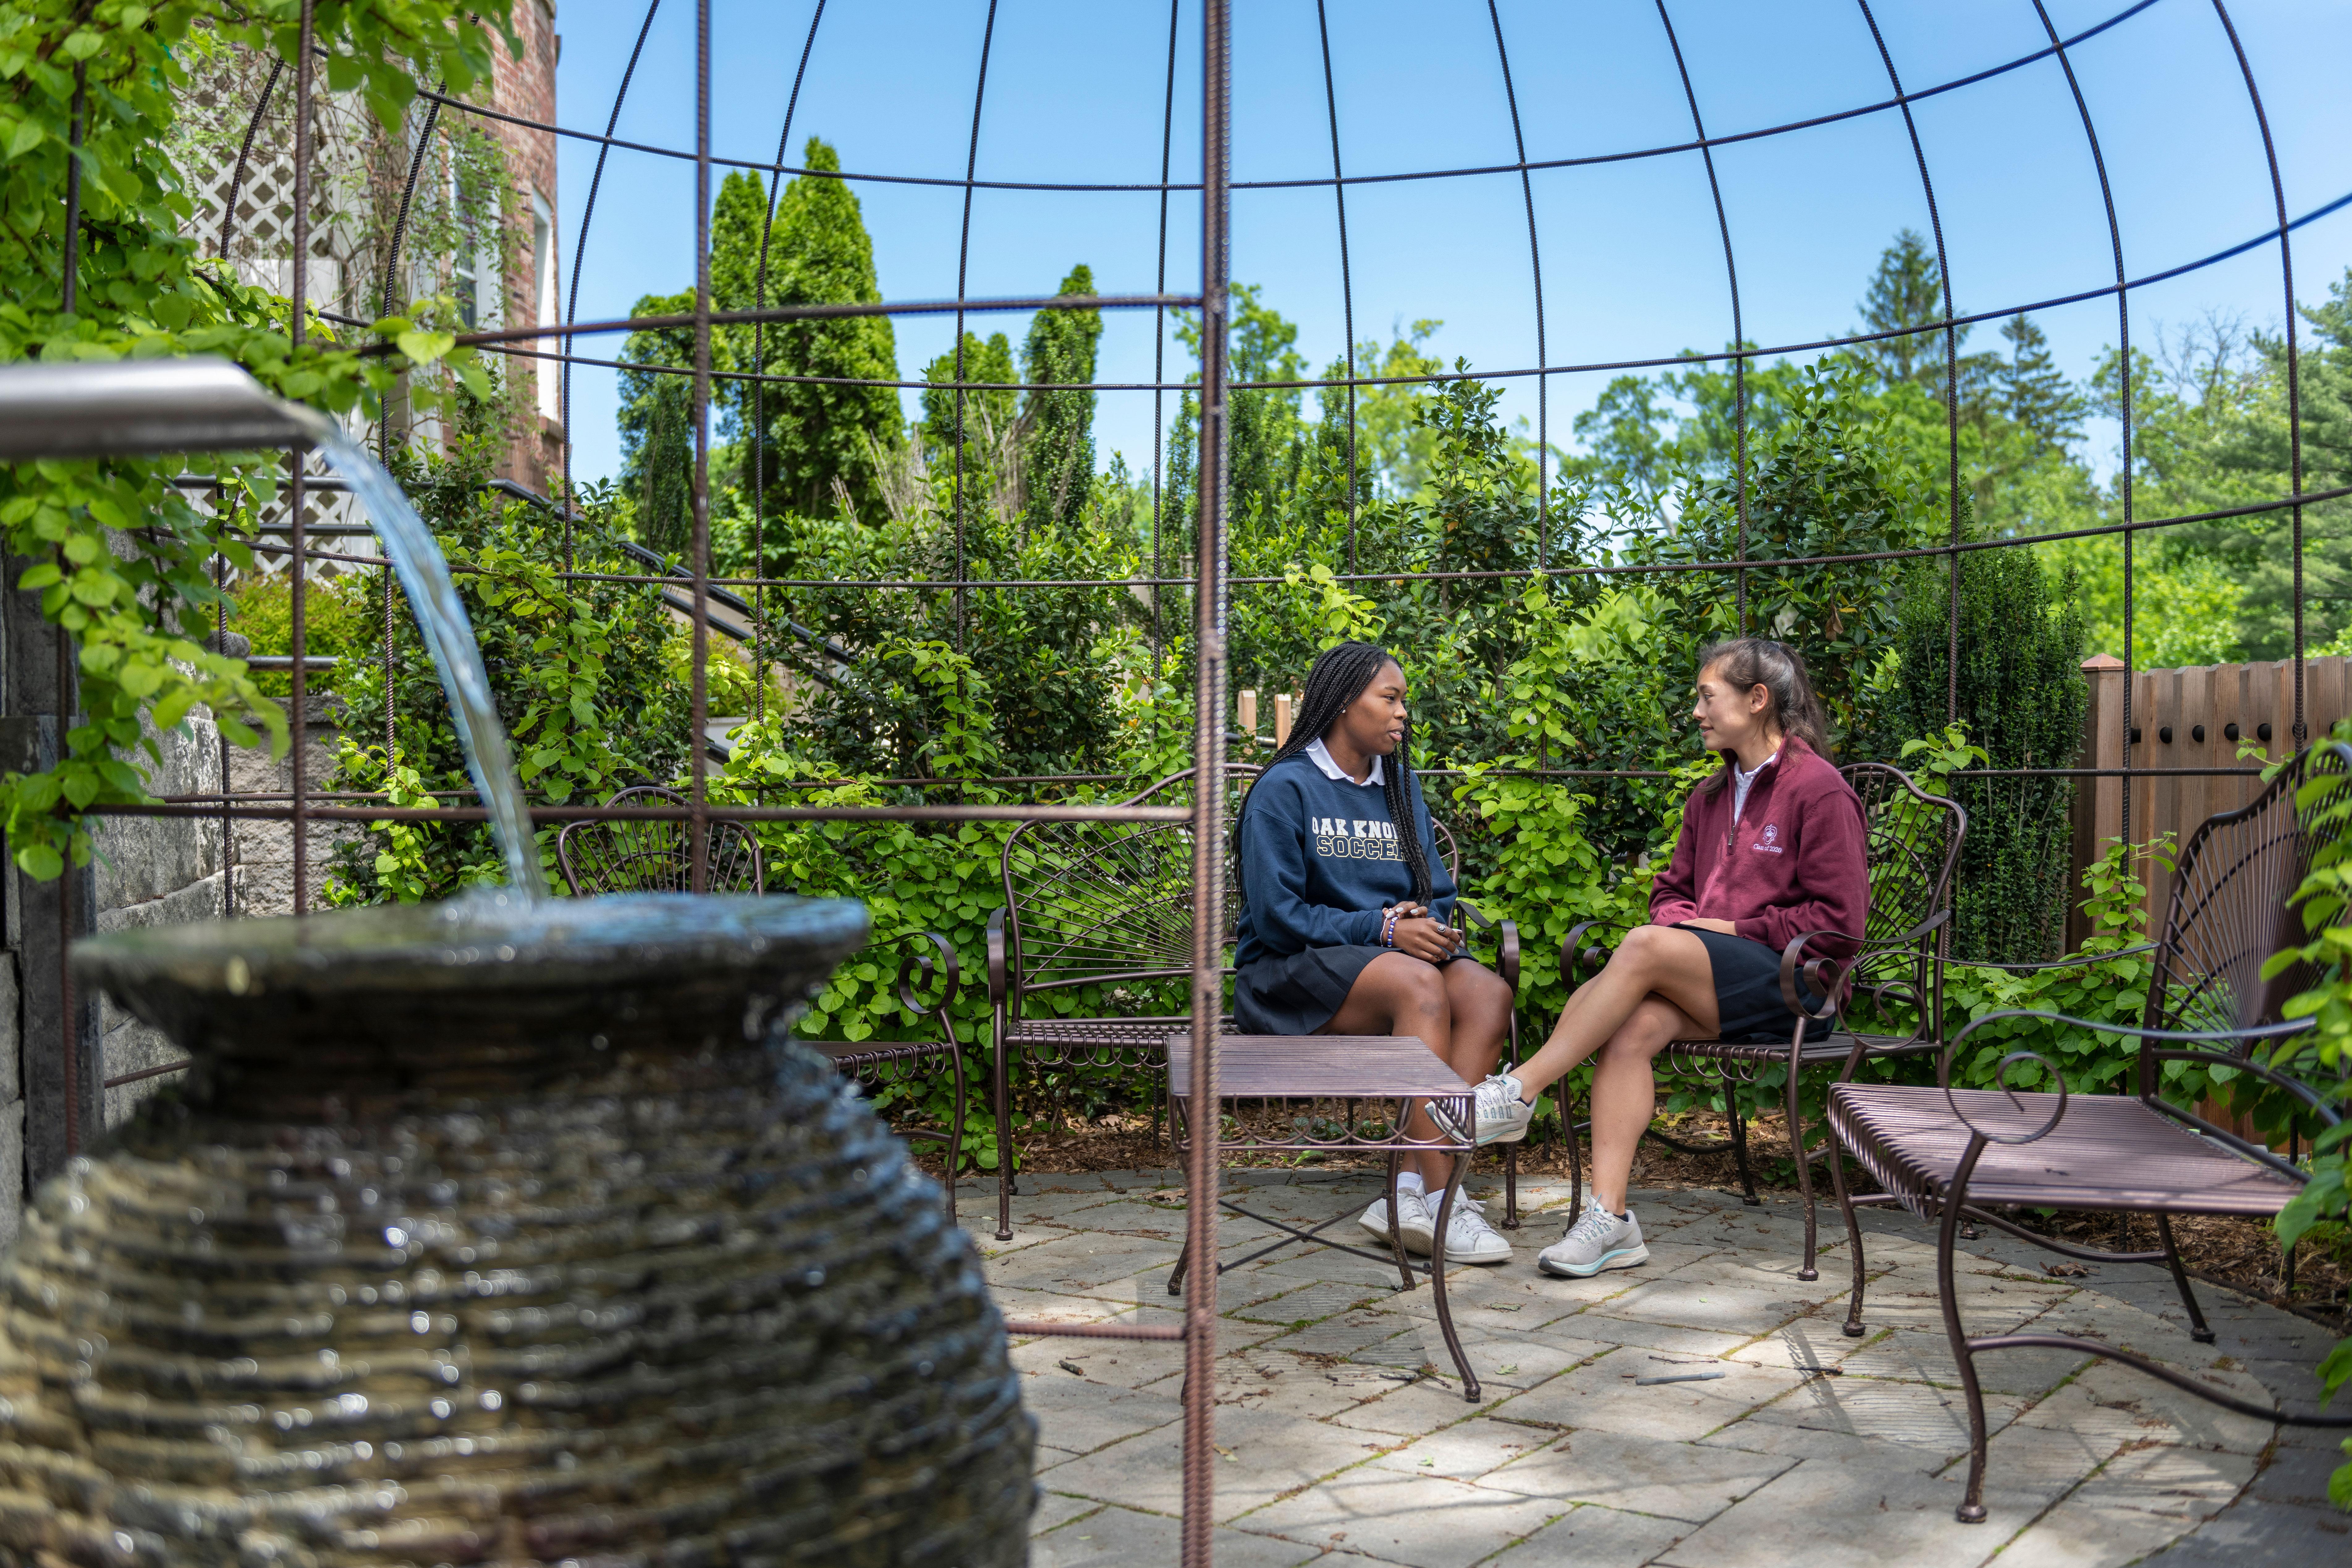 Upper School students in the prayer garden at Oak Knoll